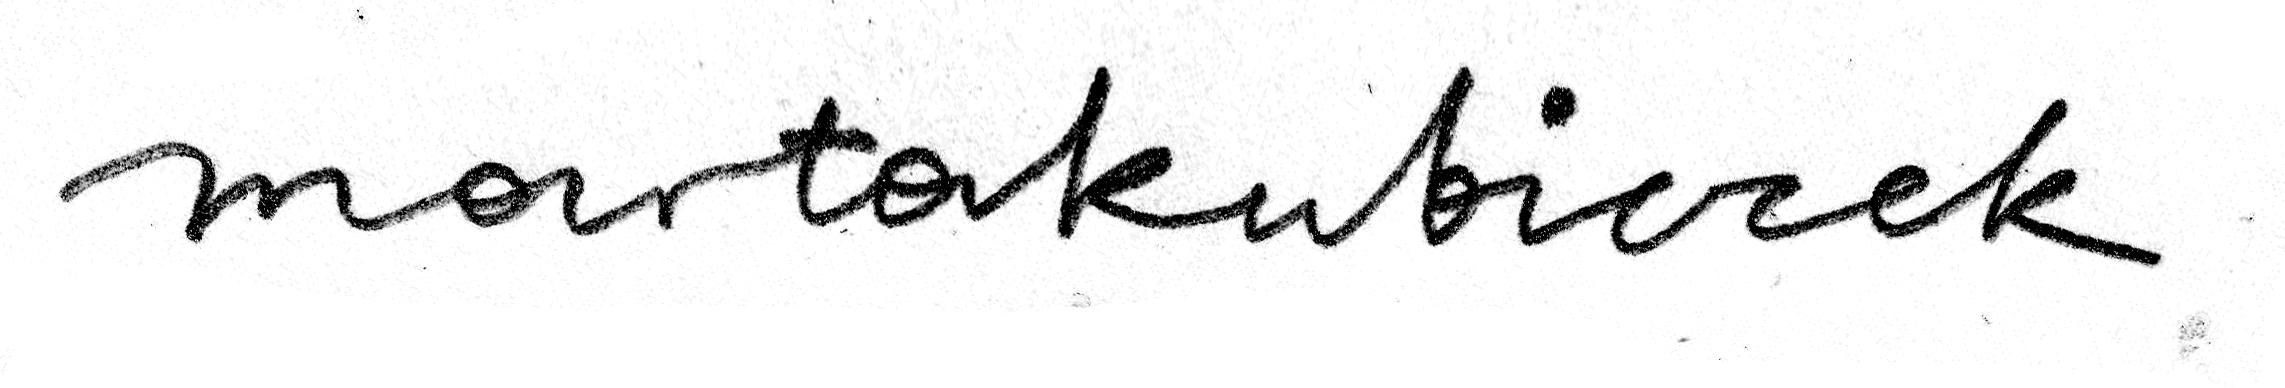 Marta Kubiczek Signature